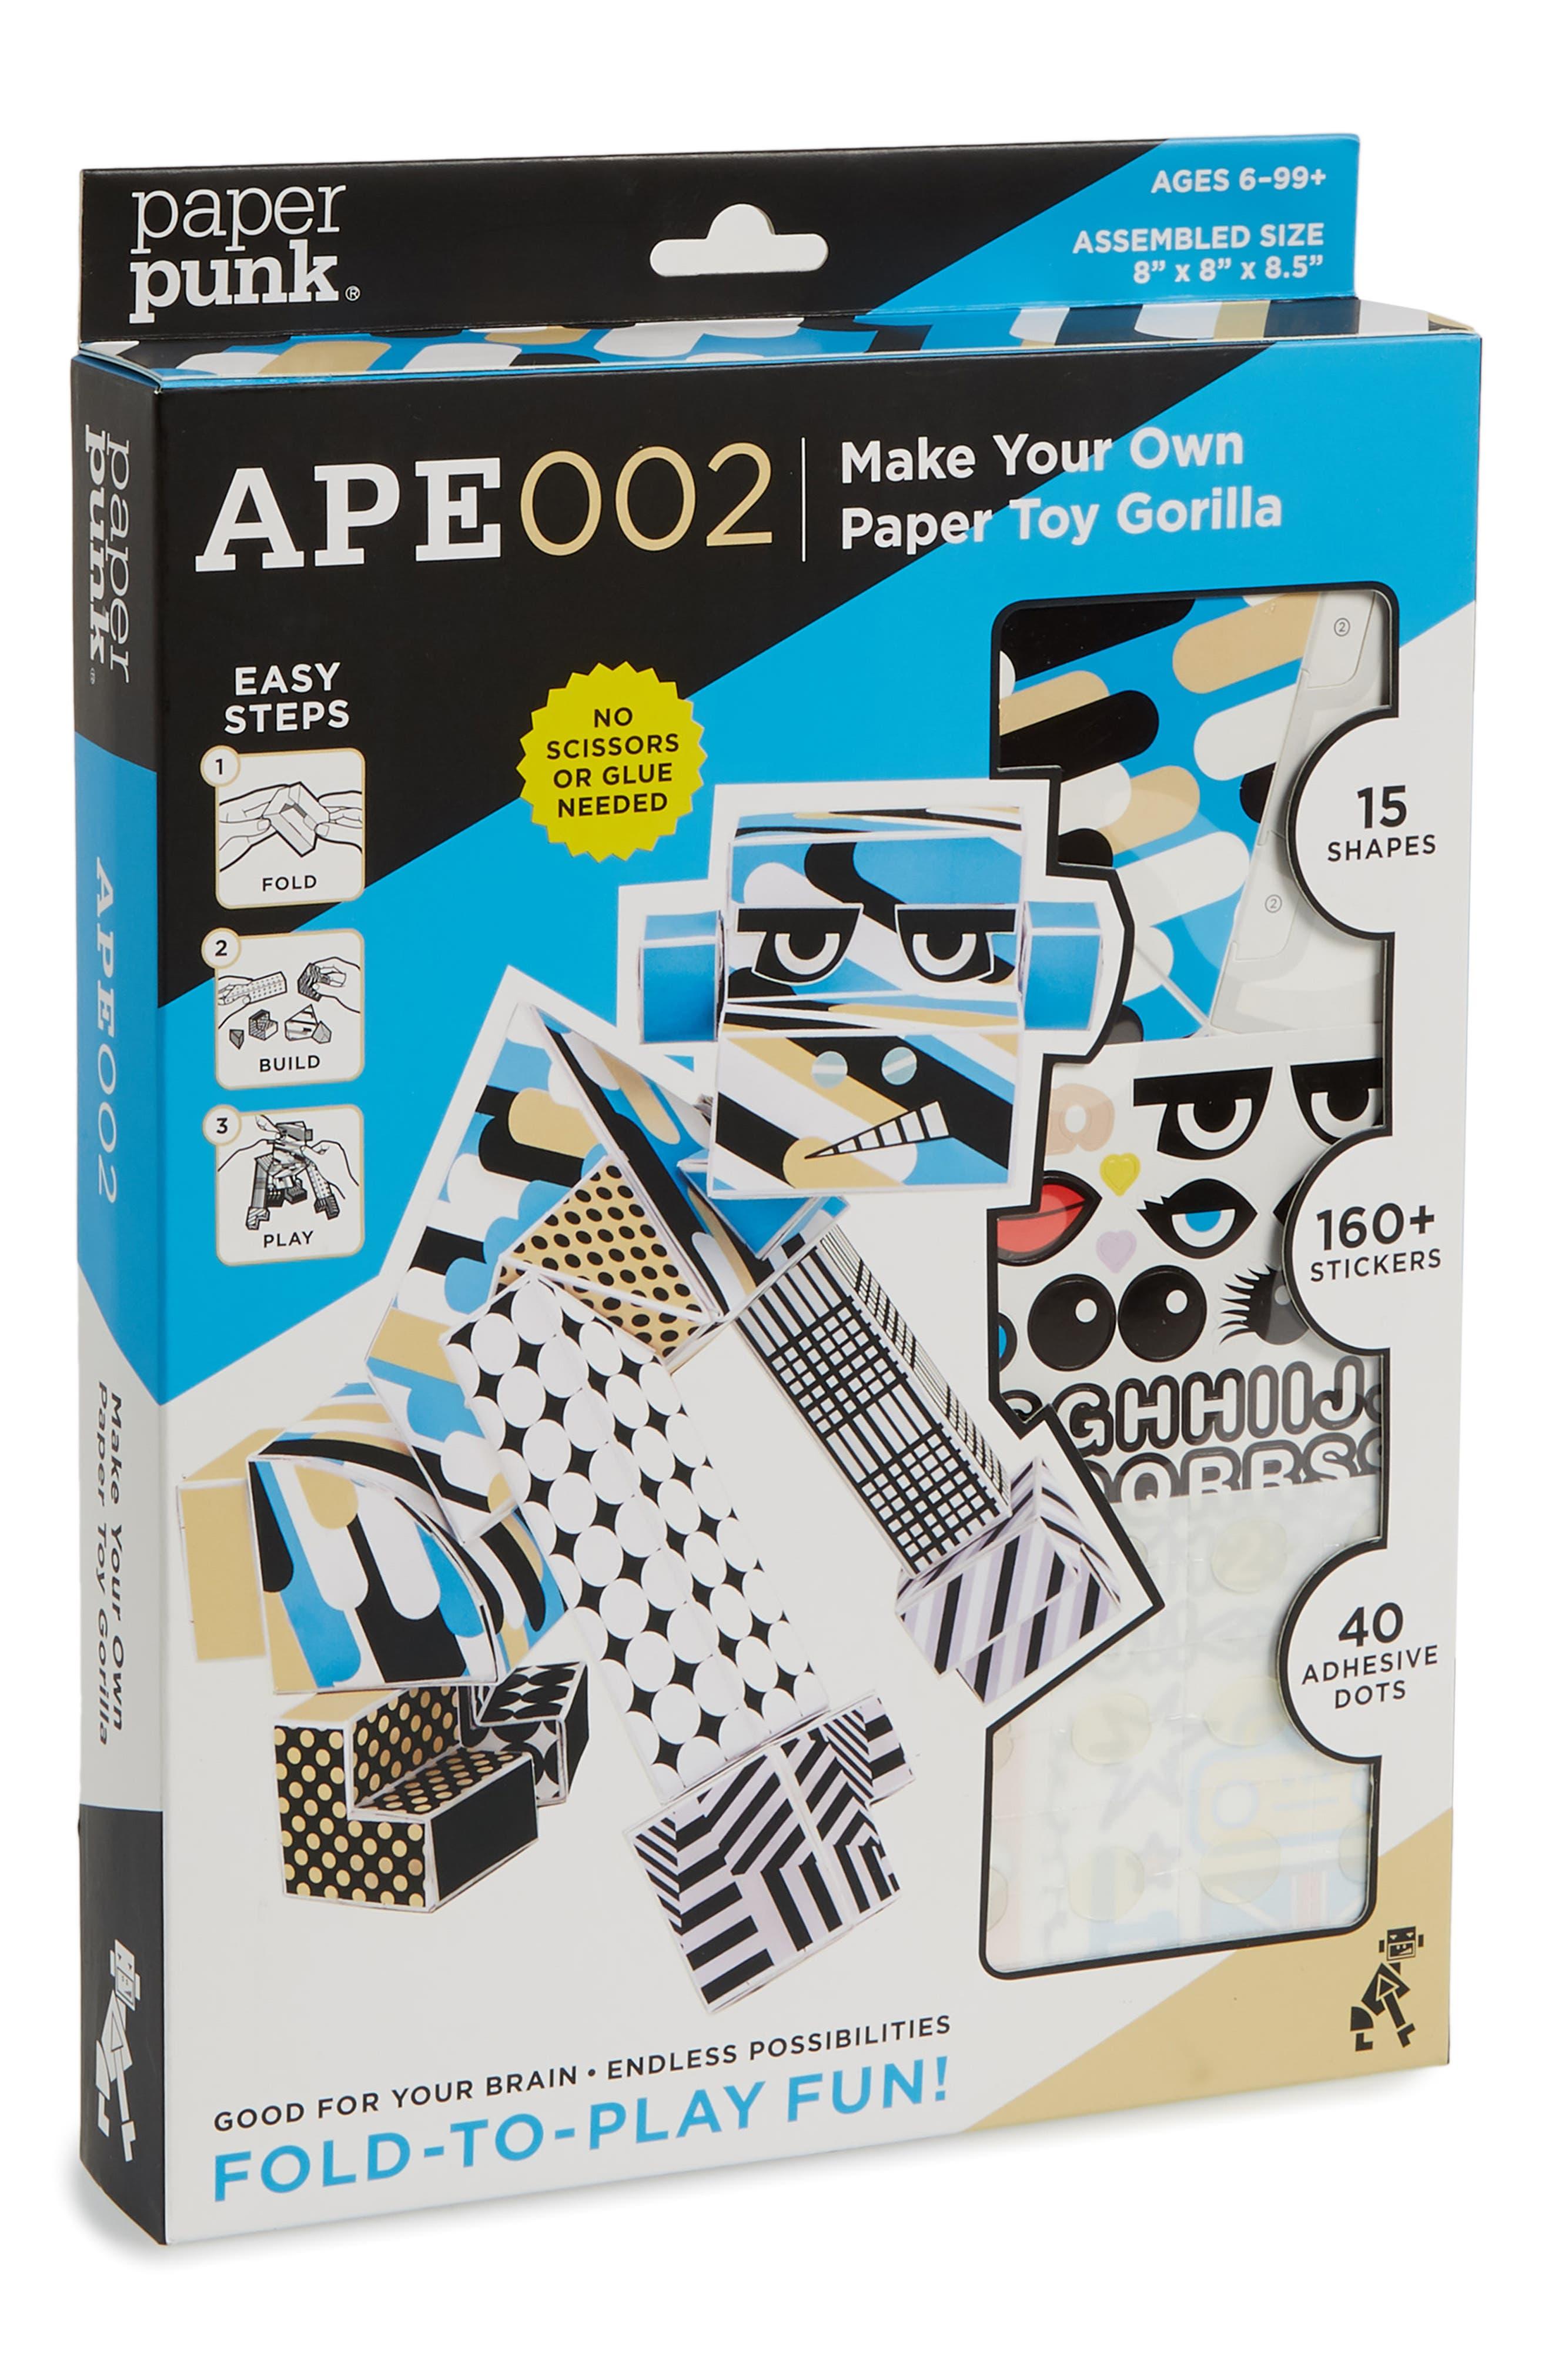 Ape002 Make Your Own Paper Toy Gorilla Kit,                         Main,                         color, Multi